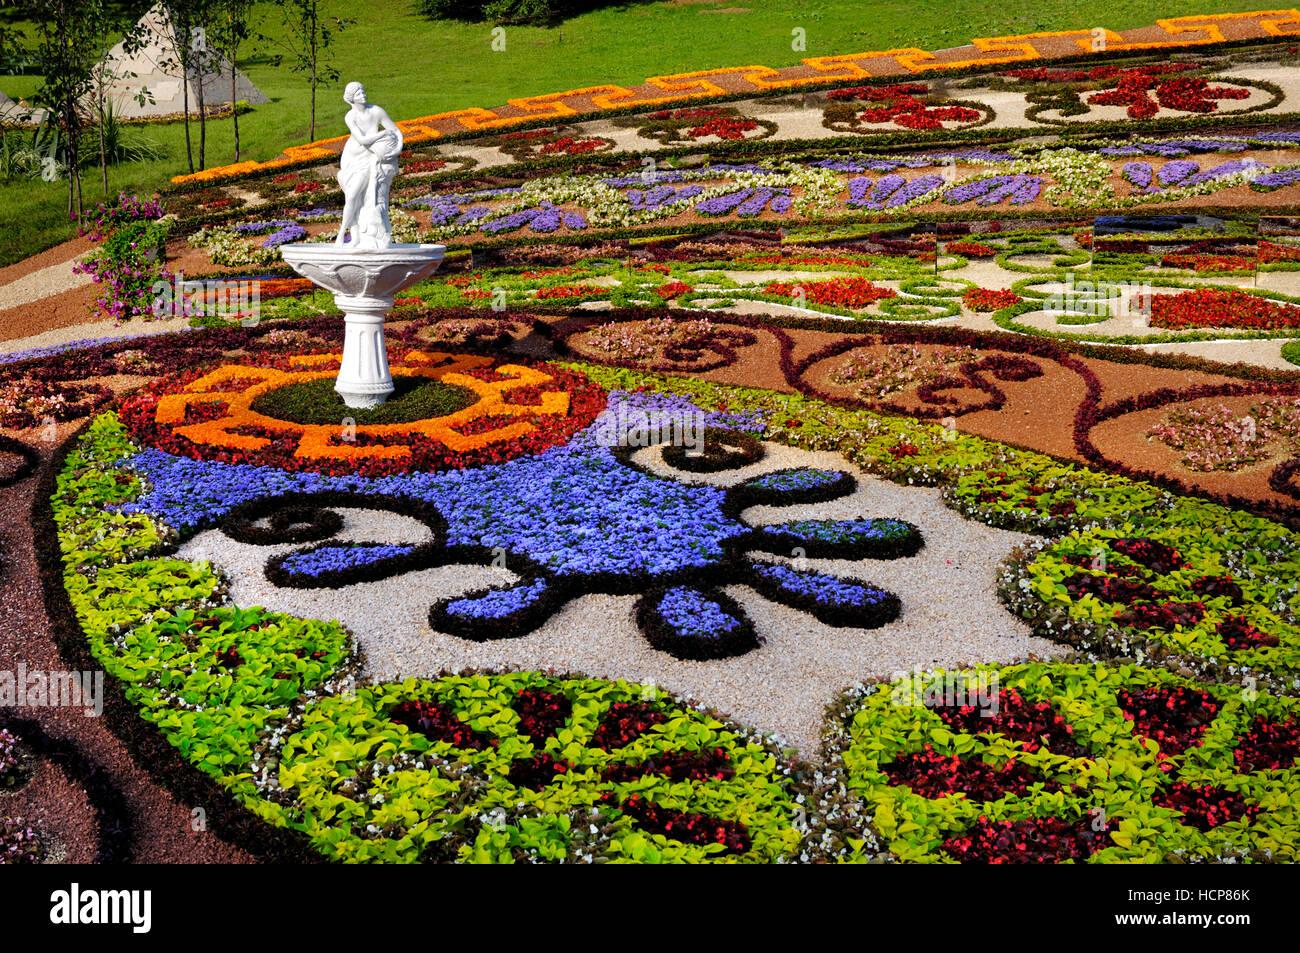 Charmant Artistic Landscape Gardening, Colorful Pattern Made Of Flowers, Kiev,  Ukraine   Stock Image